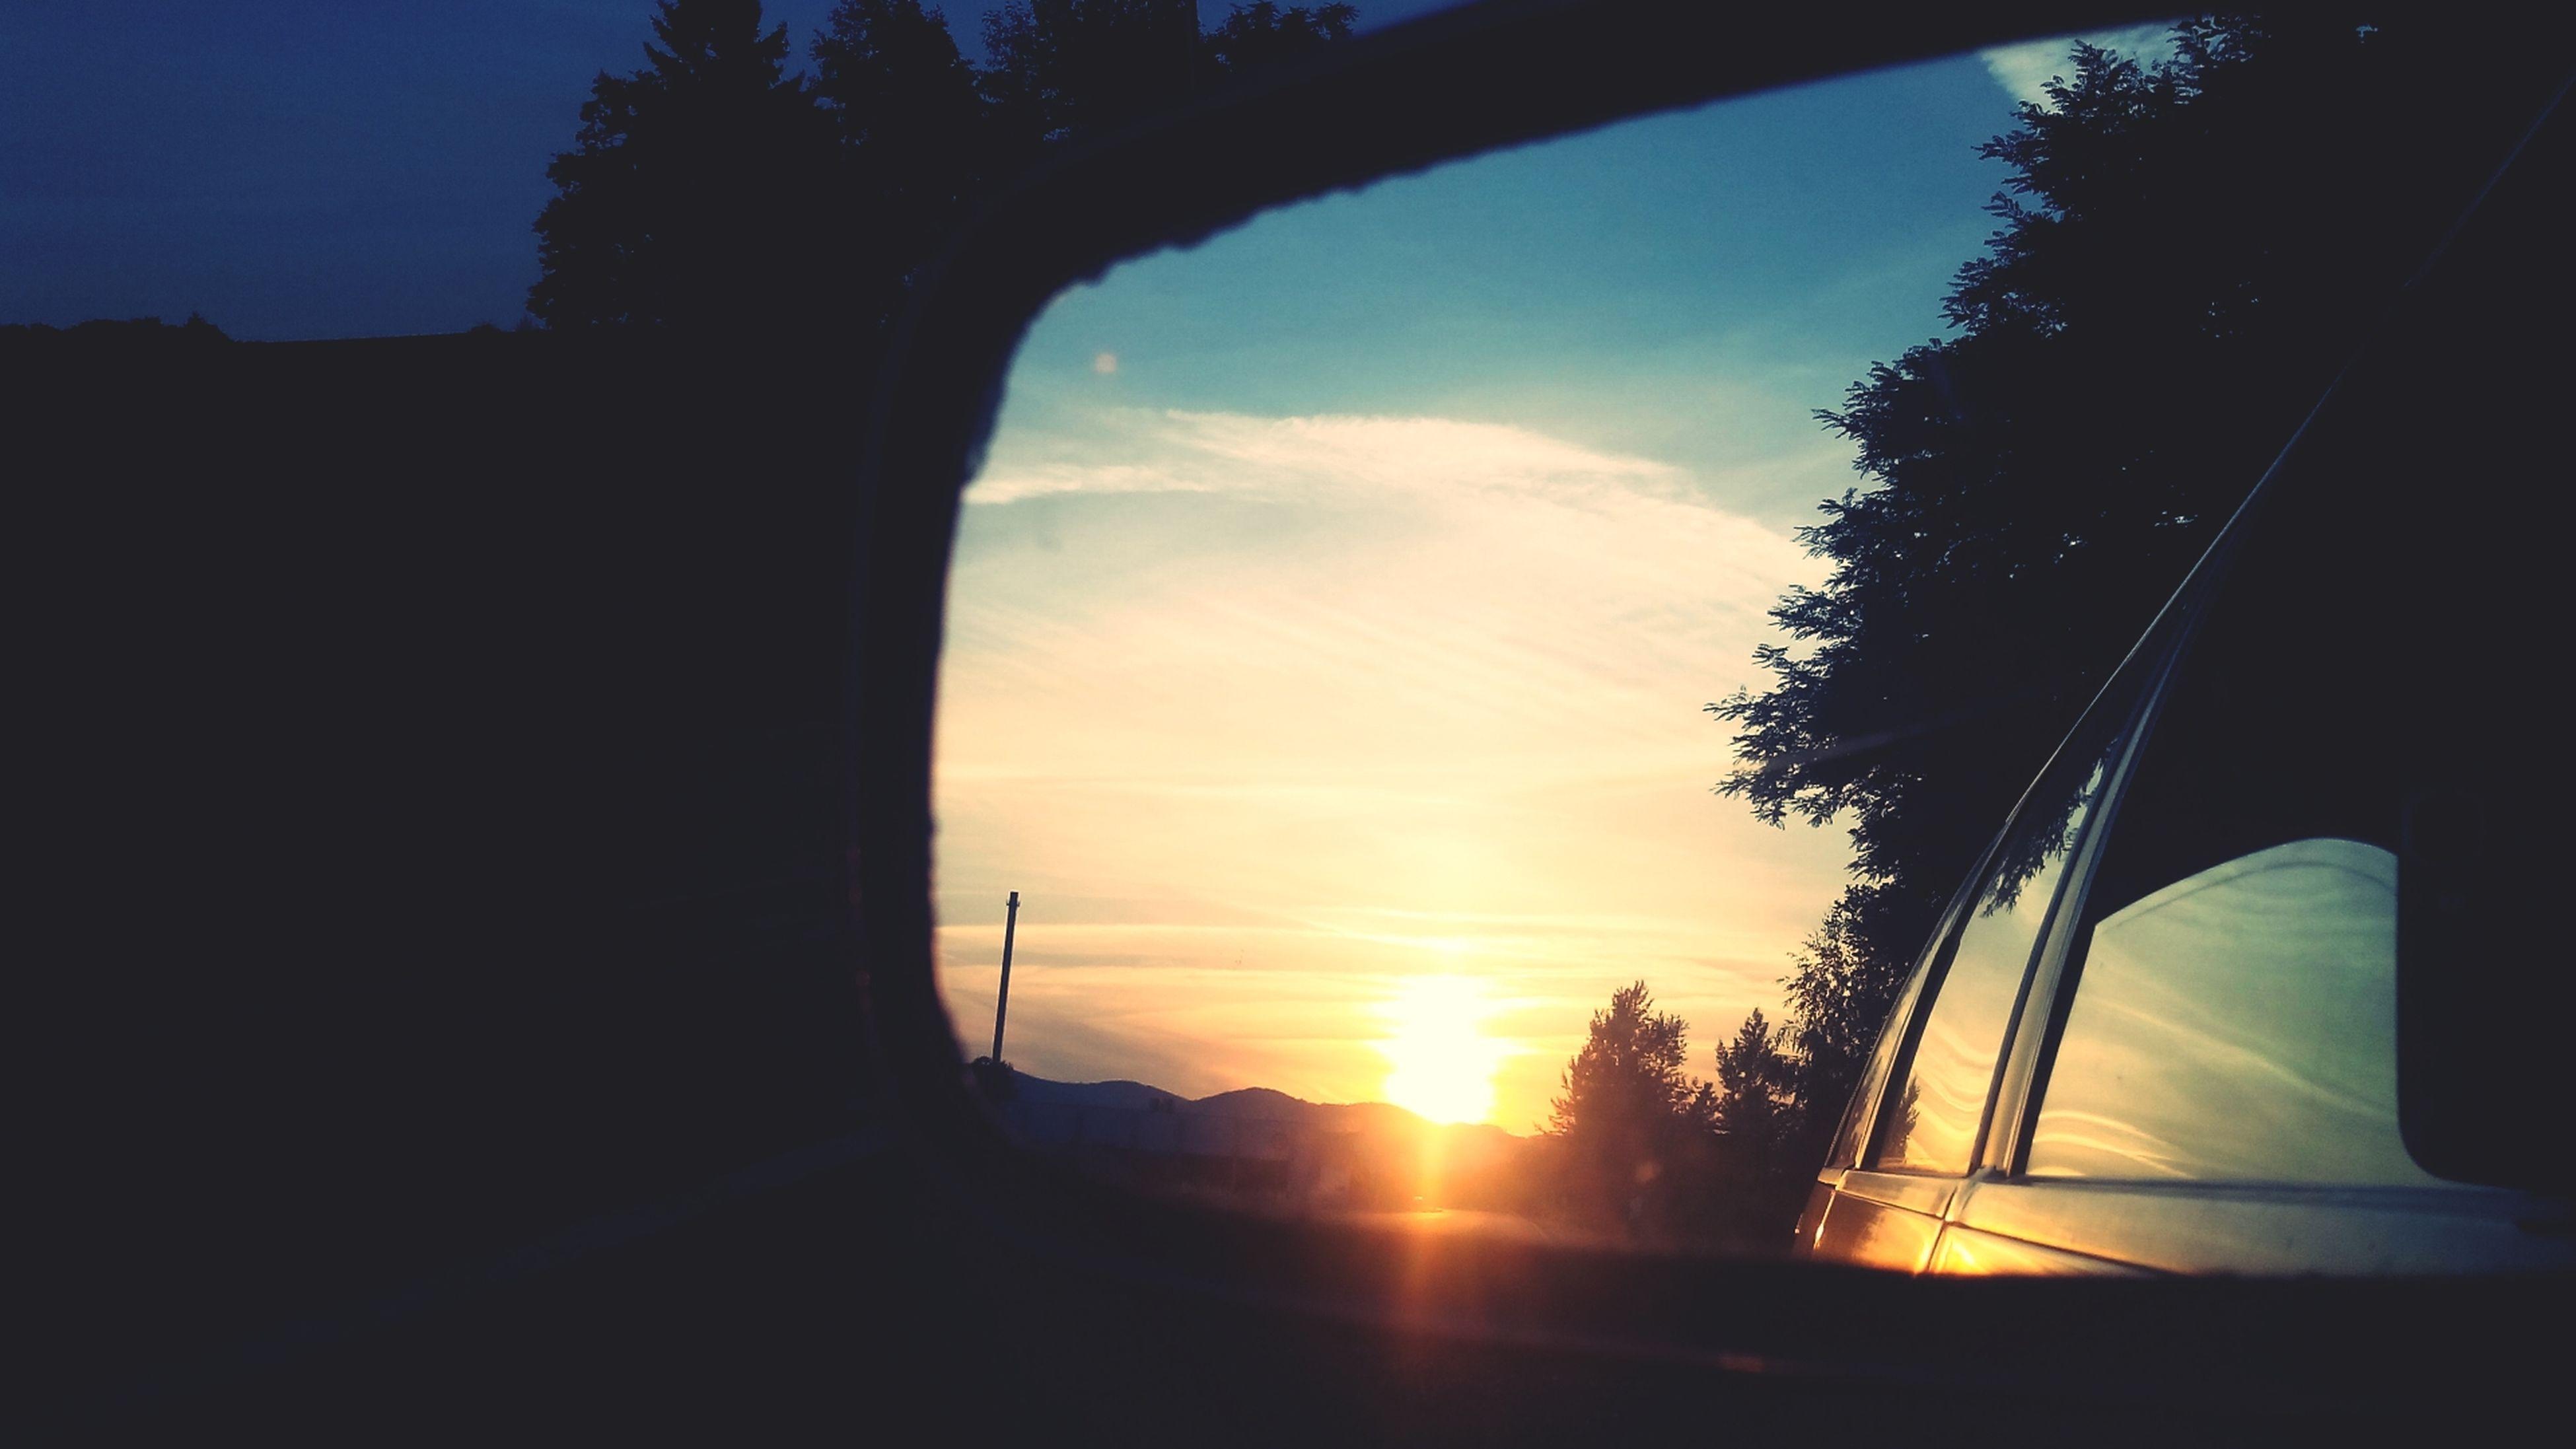 sunset, silhouette, sun, sky, transportation, car, tree, sunlight, mode of transport, land vehicle, road, orange color, beauty in nature, nature, sunbeam, cloud, scenics, tranquility, cloud - sky, vehicle interior